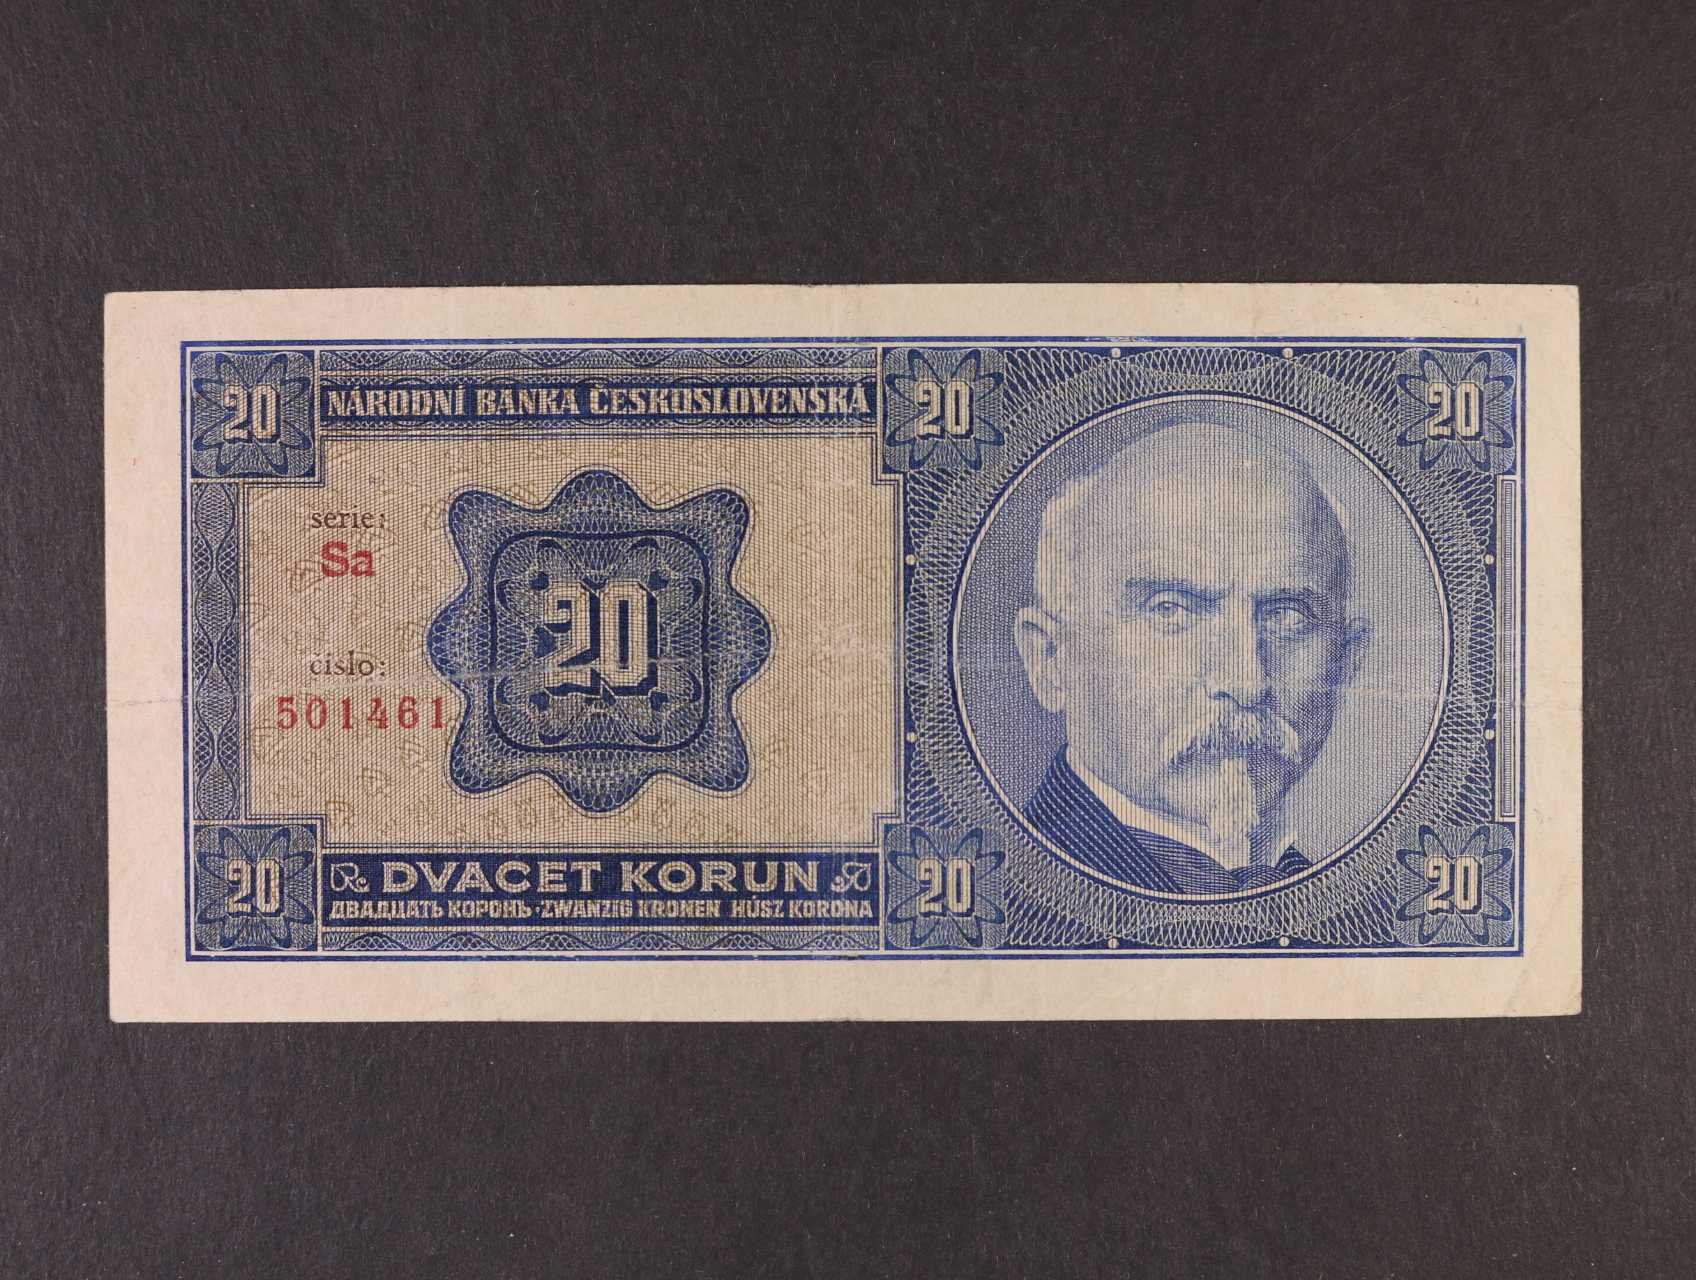 20 Kč 1.10.1926 série Sa tisk Haase Praha, Ba. 21b1, Pi. 21a